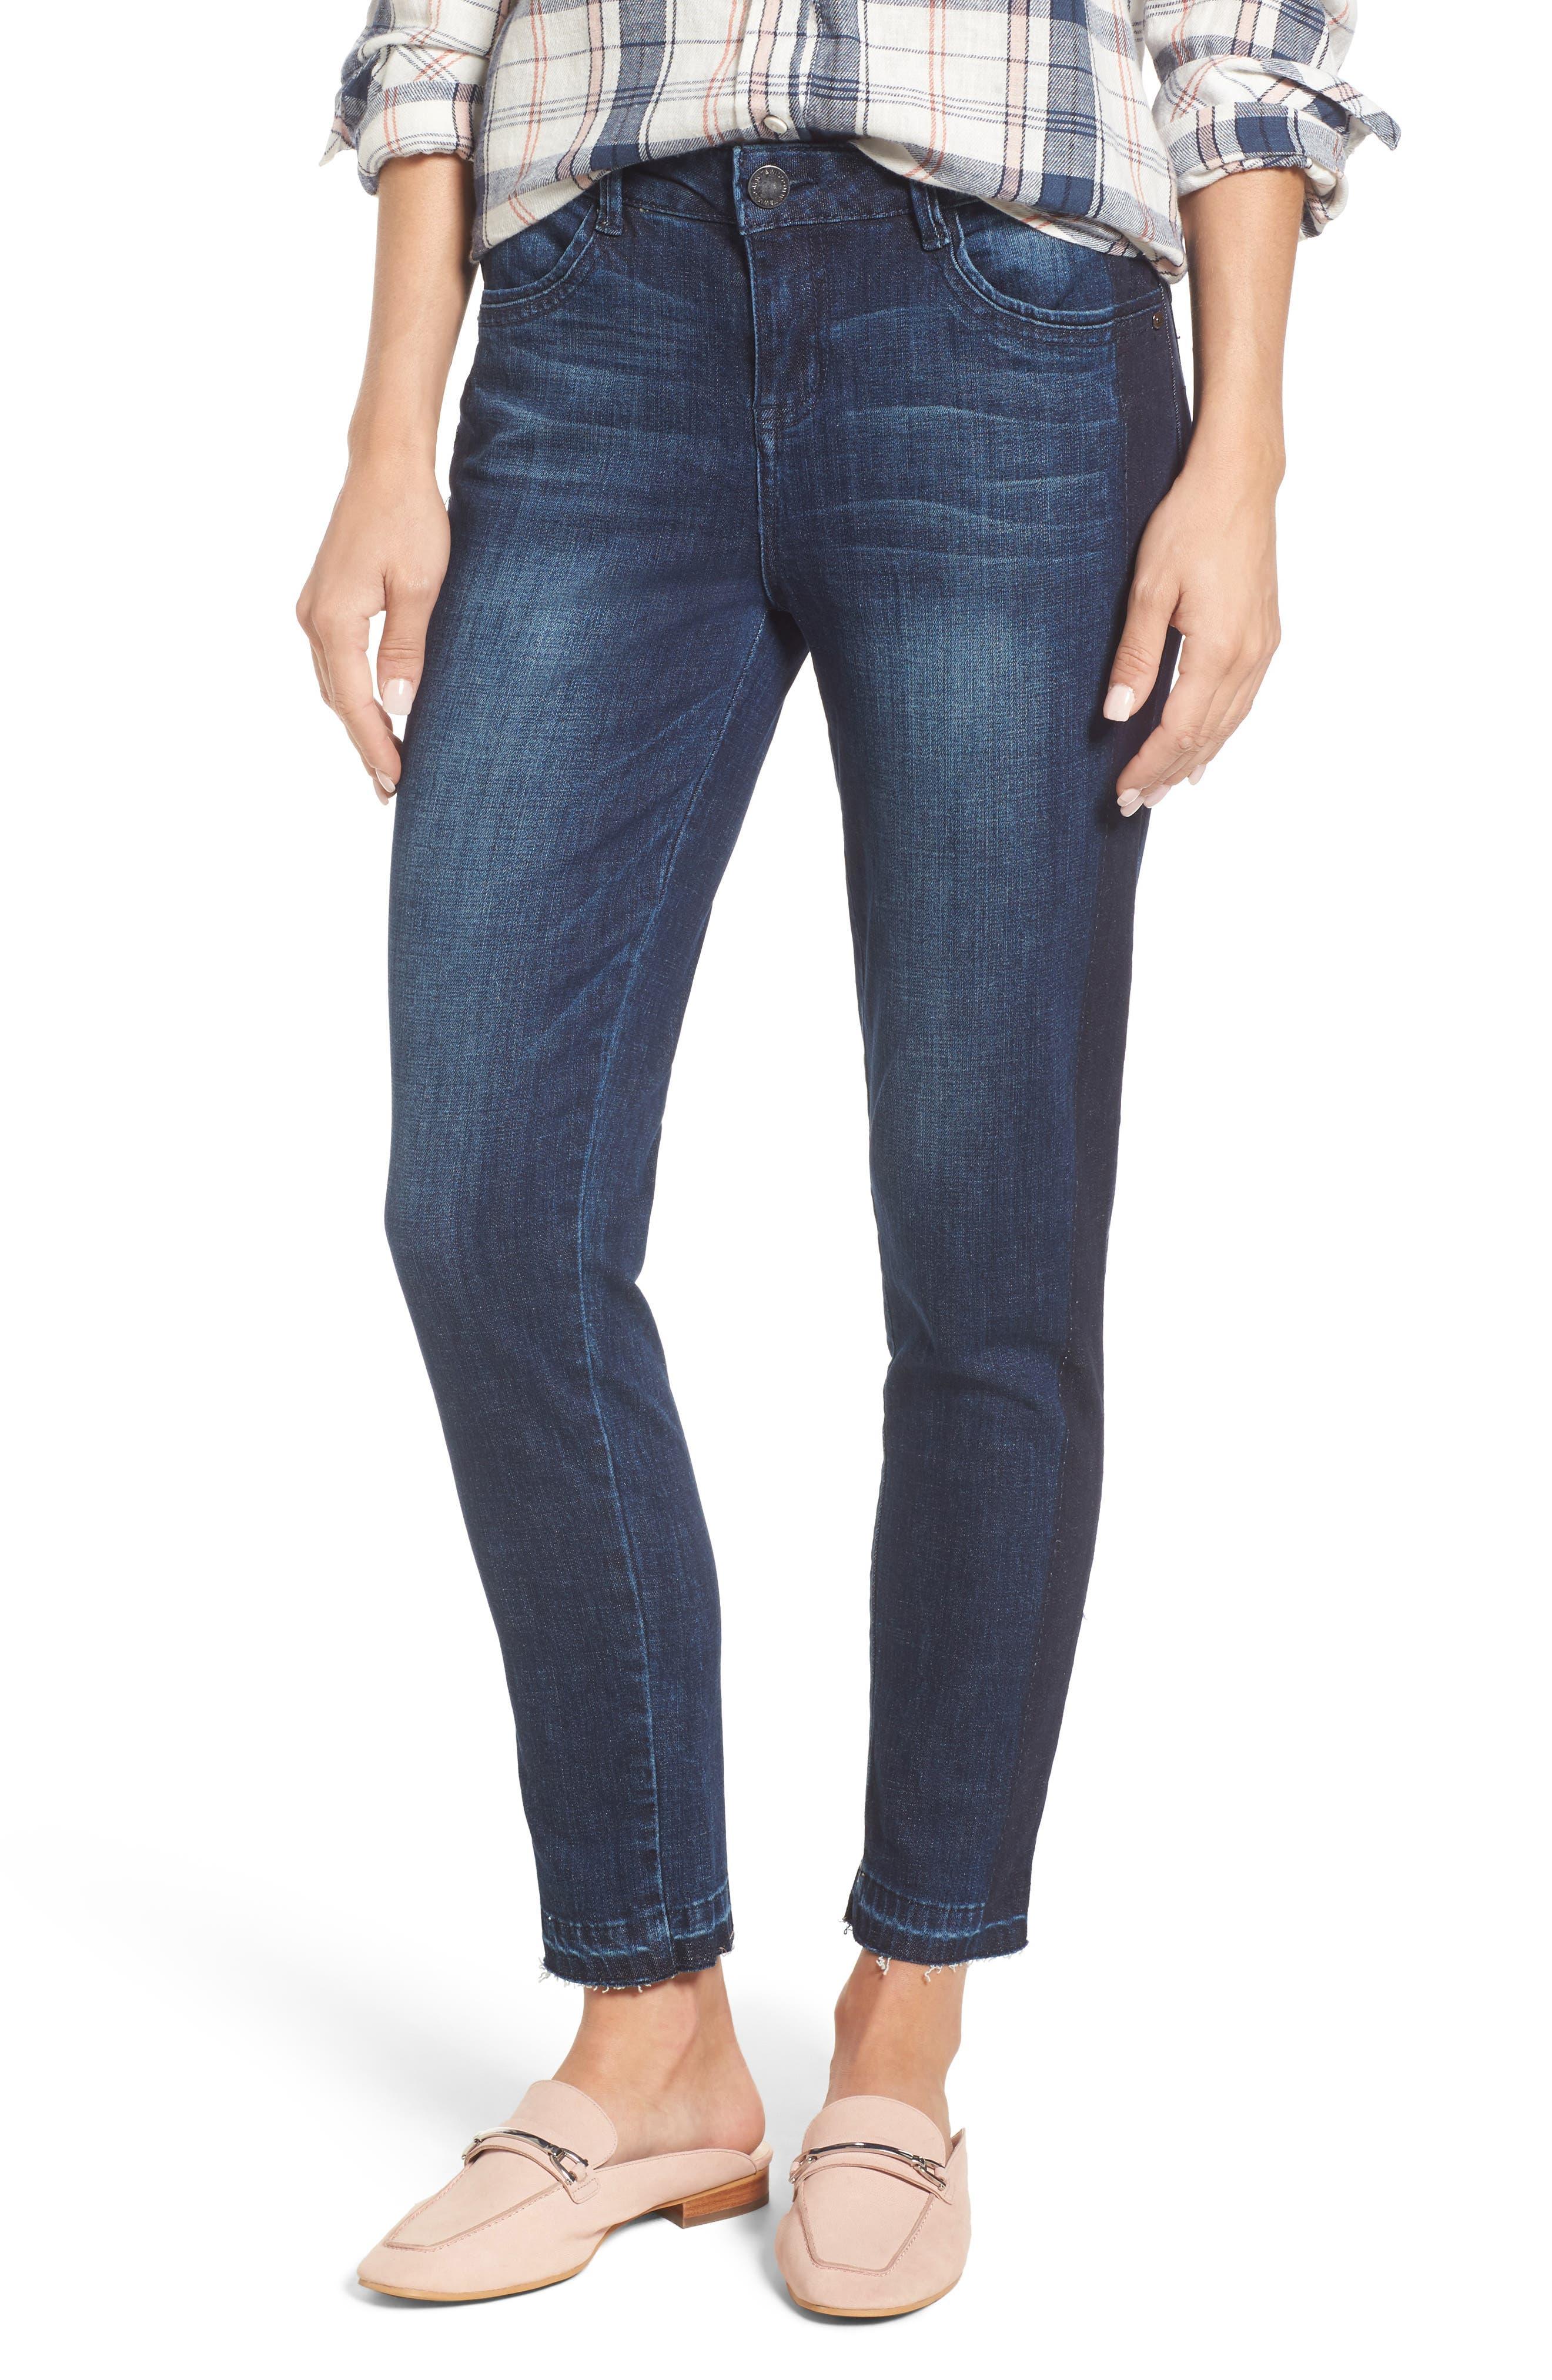 Wit & Wisdom Tuxedo Stripe Skinny Jeans (Nordstrom Exclusive)